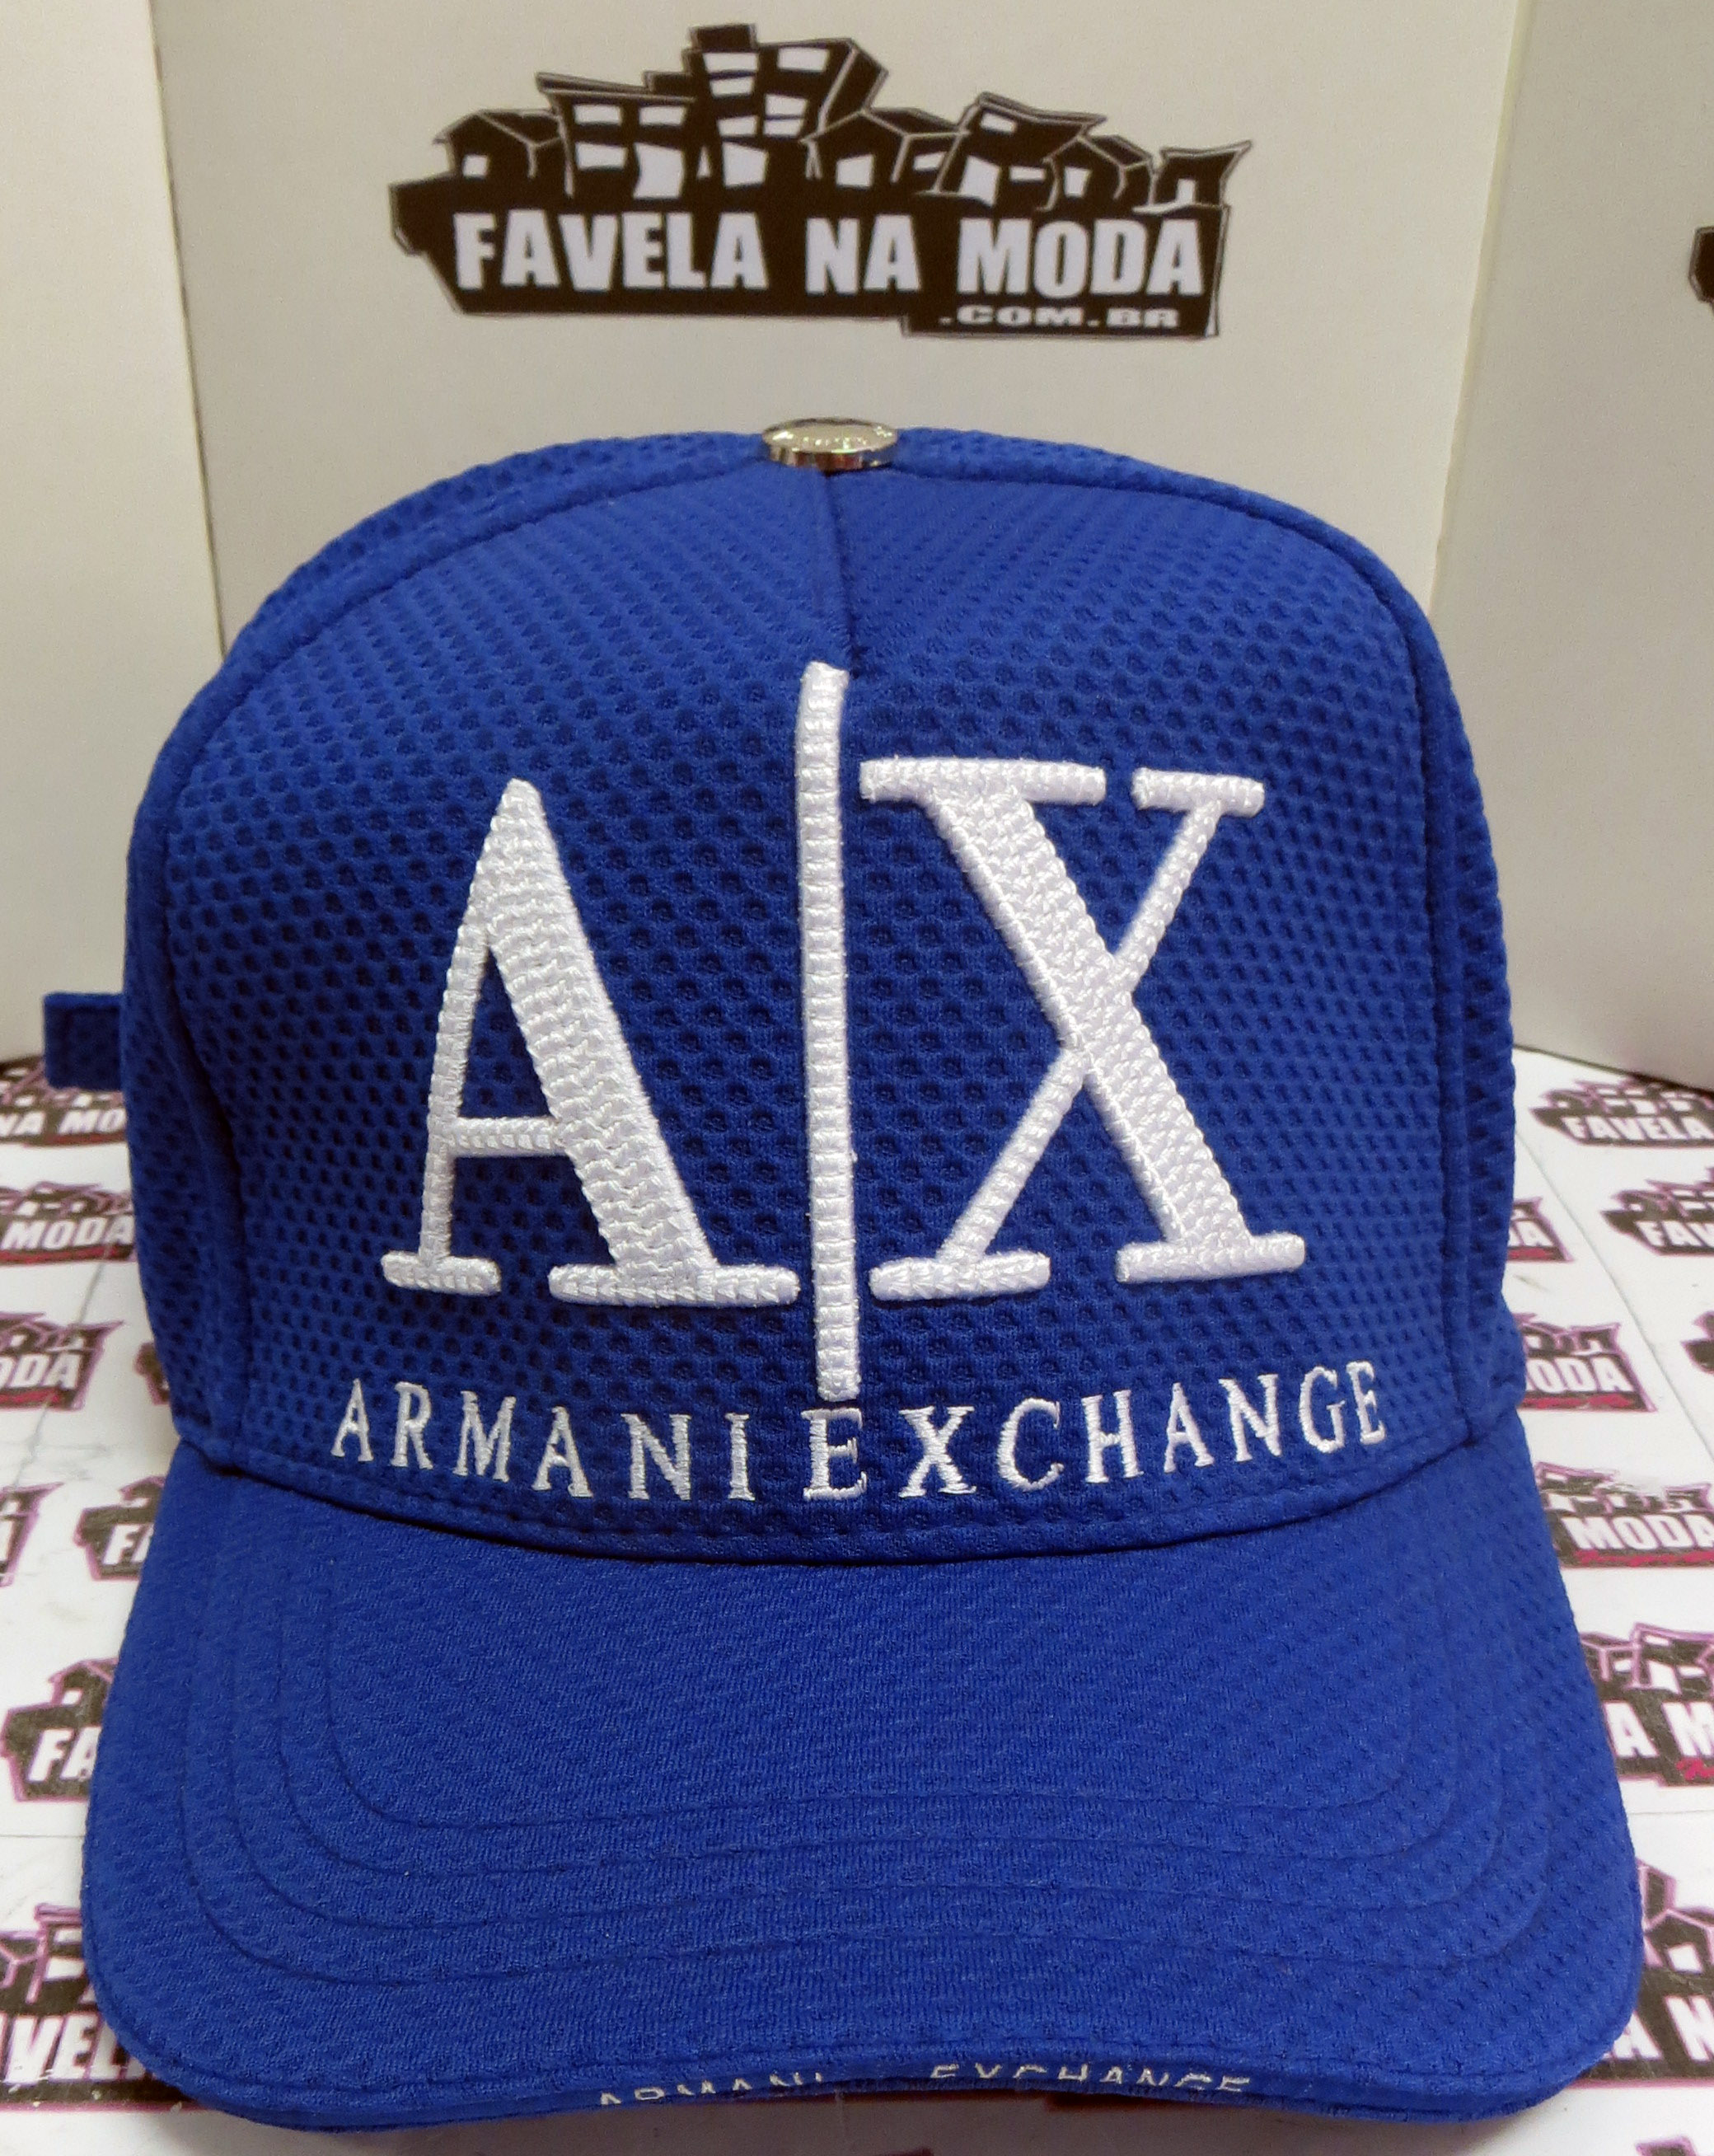 Bonés - Armani Exchange - Favela na Moda Imports 8413a975846a1